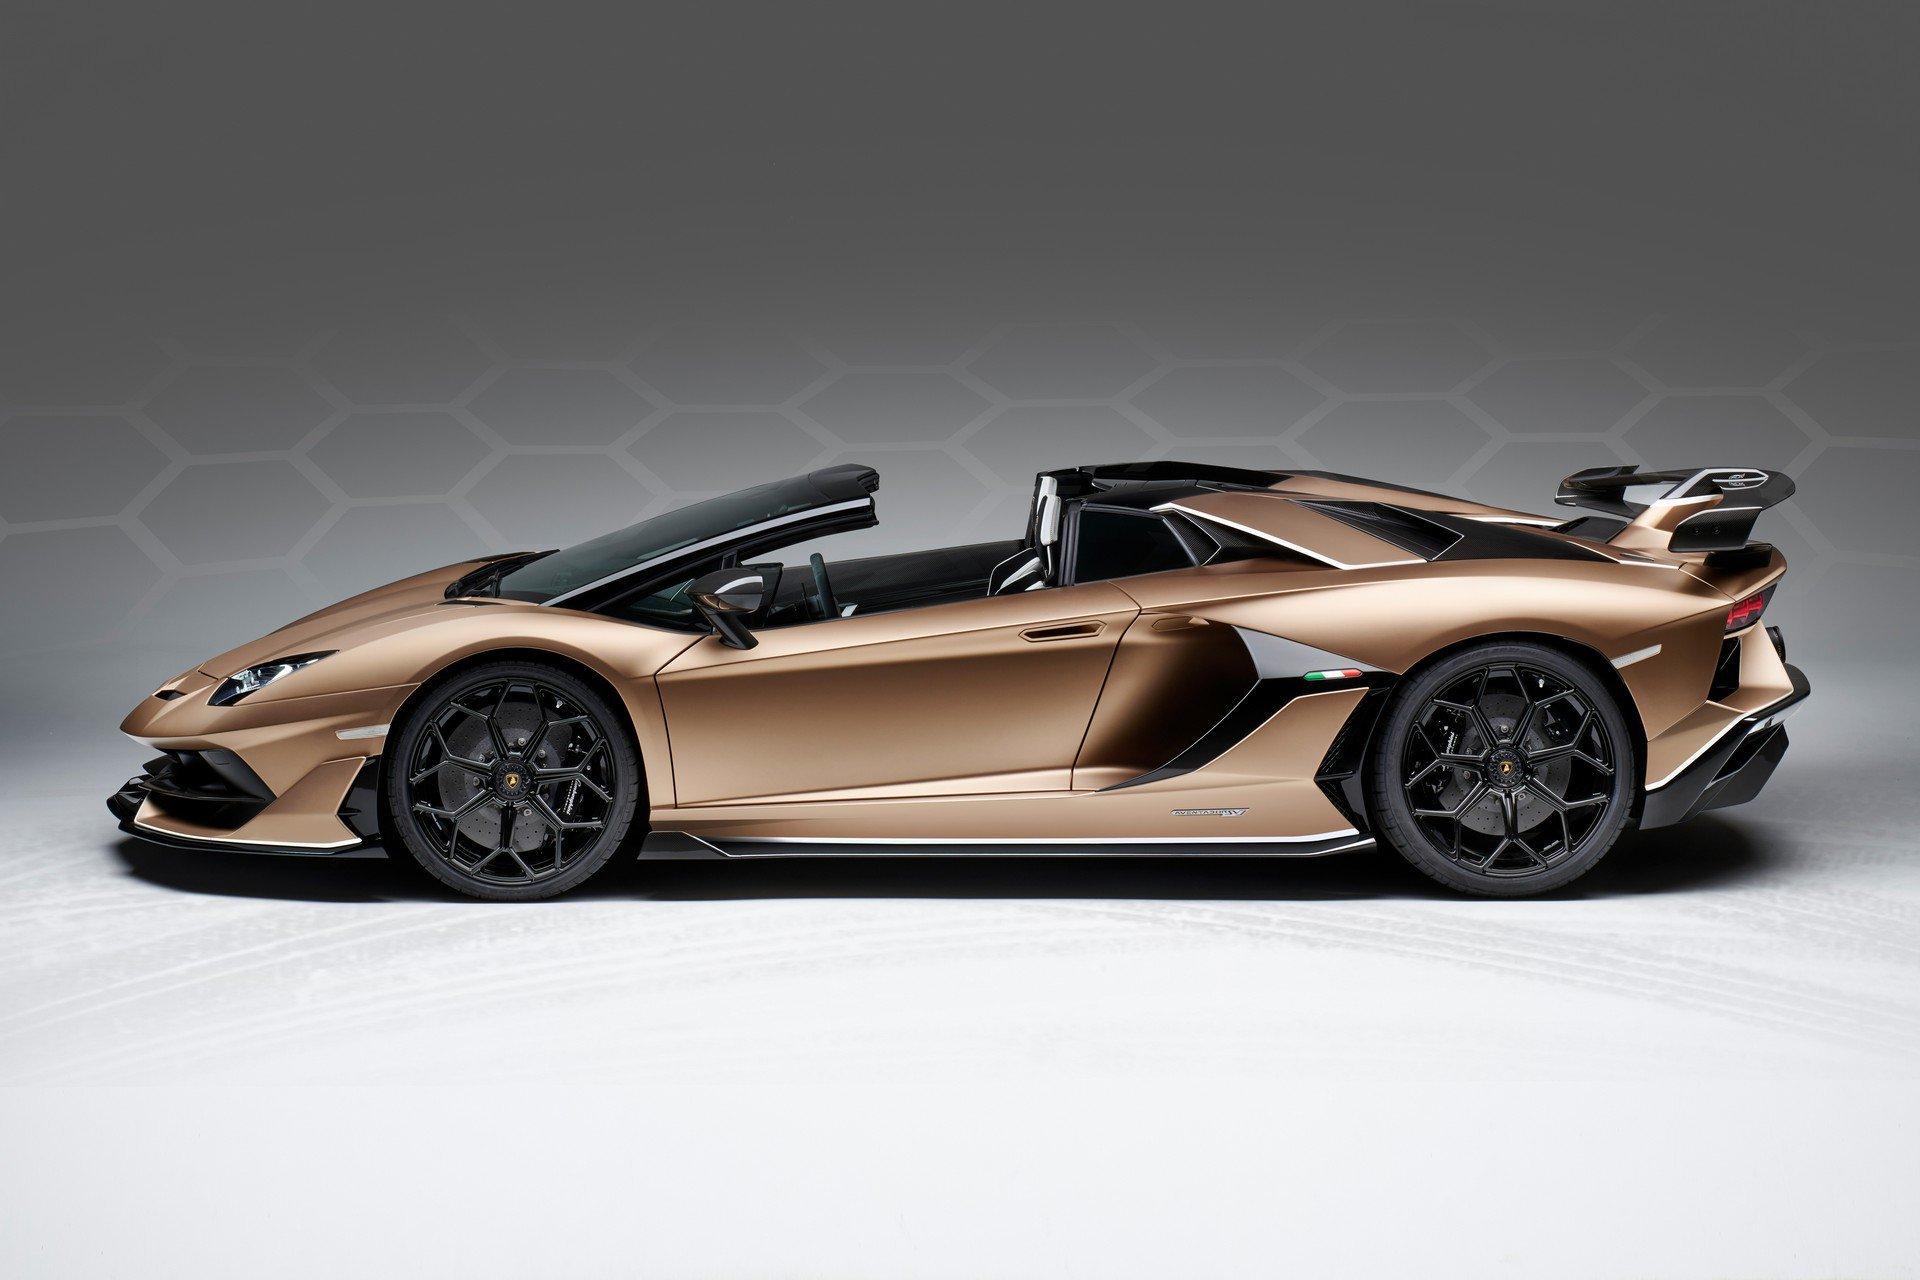 兰博基尼Aventador SVJ敞篷跑车